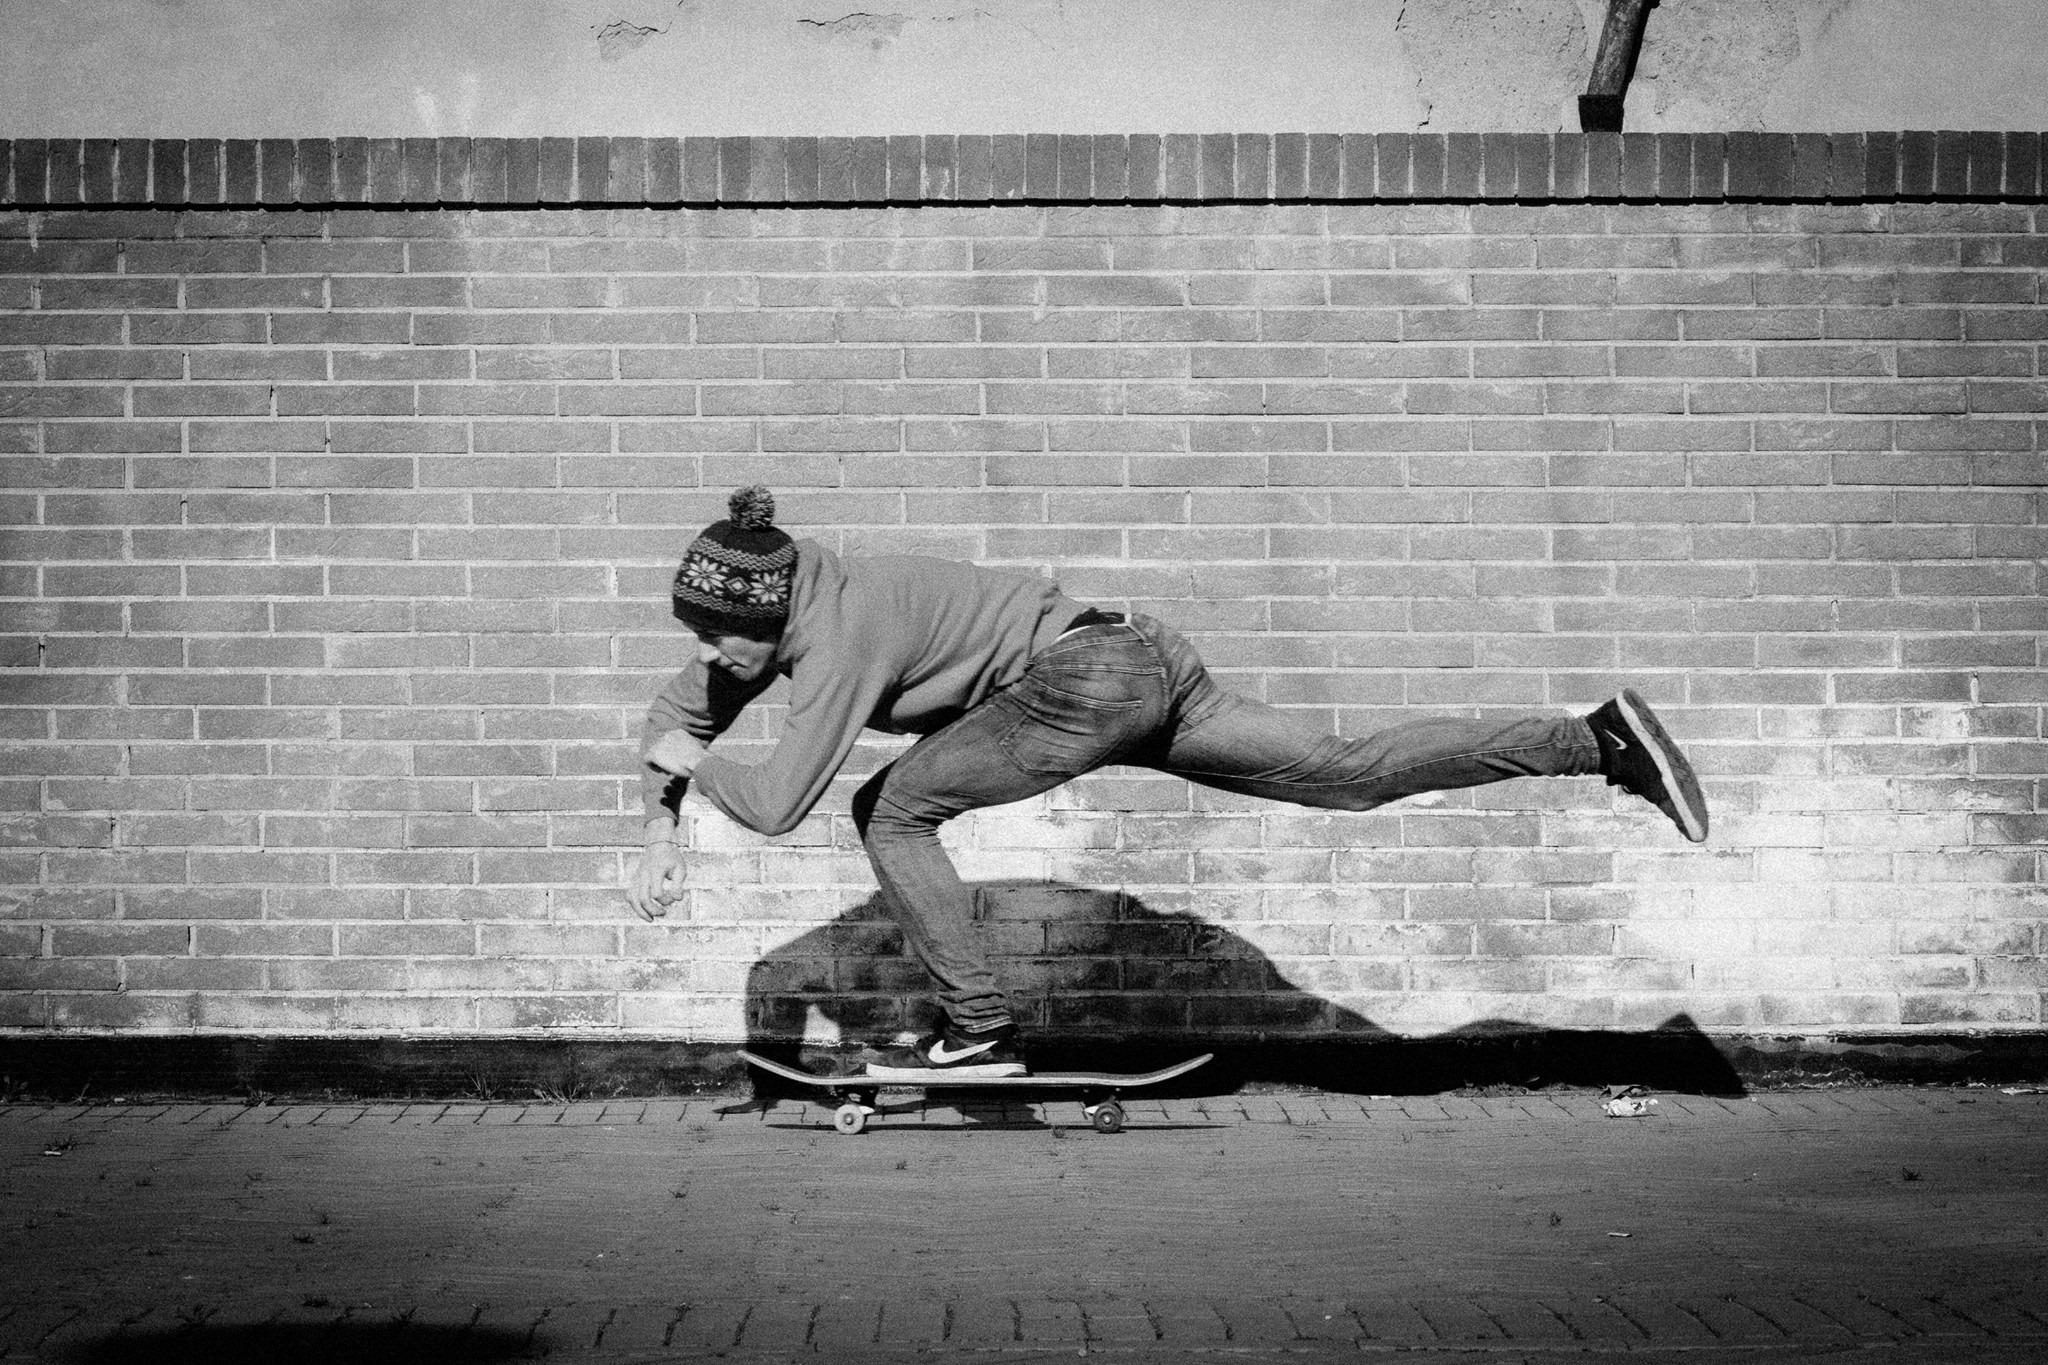 Tommaso Beni skater di Firenze